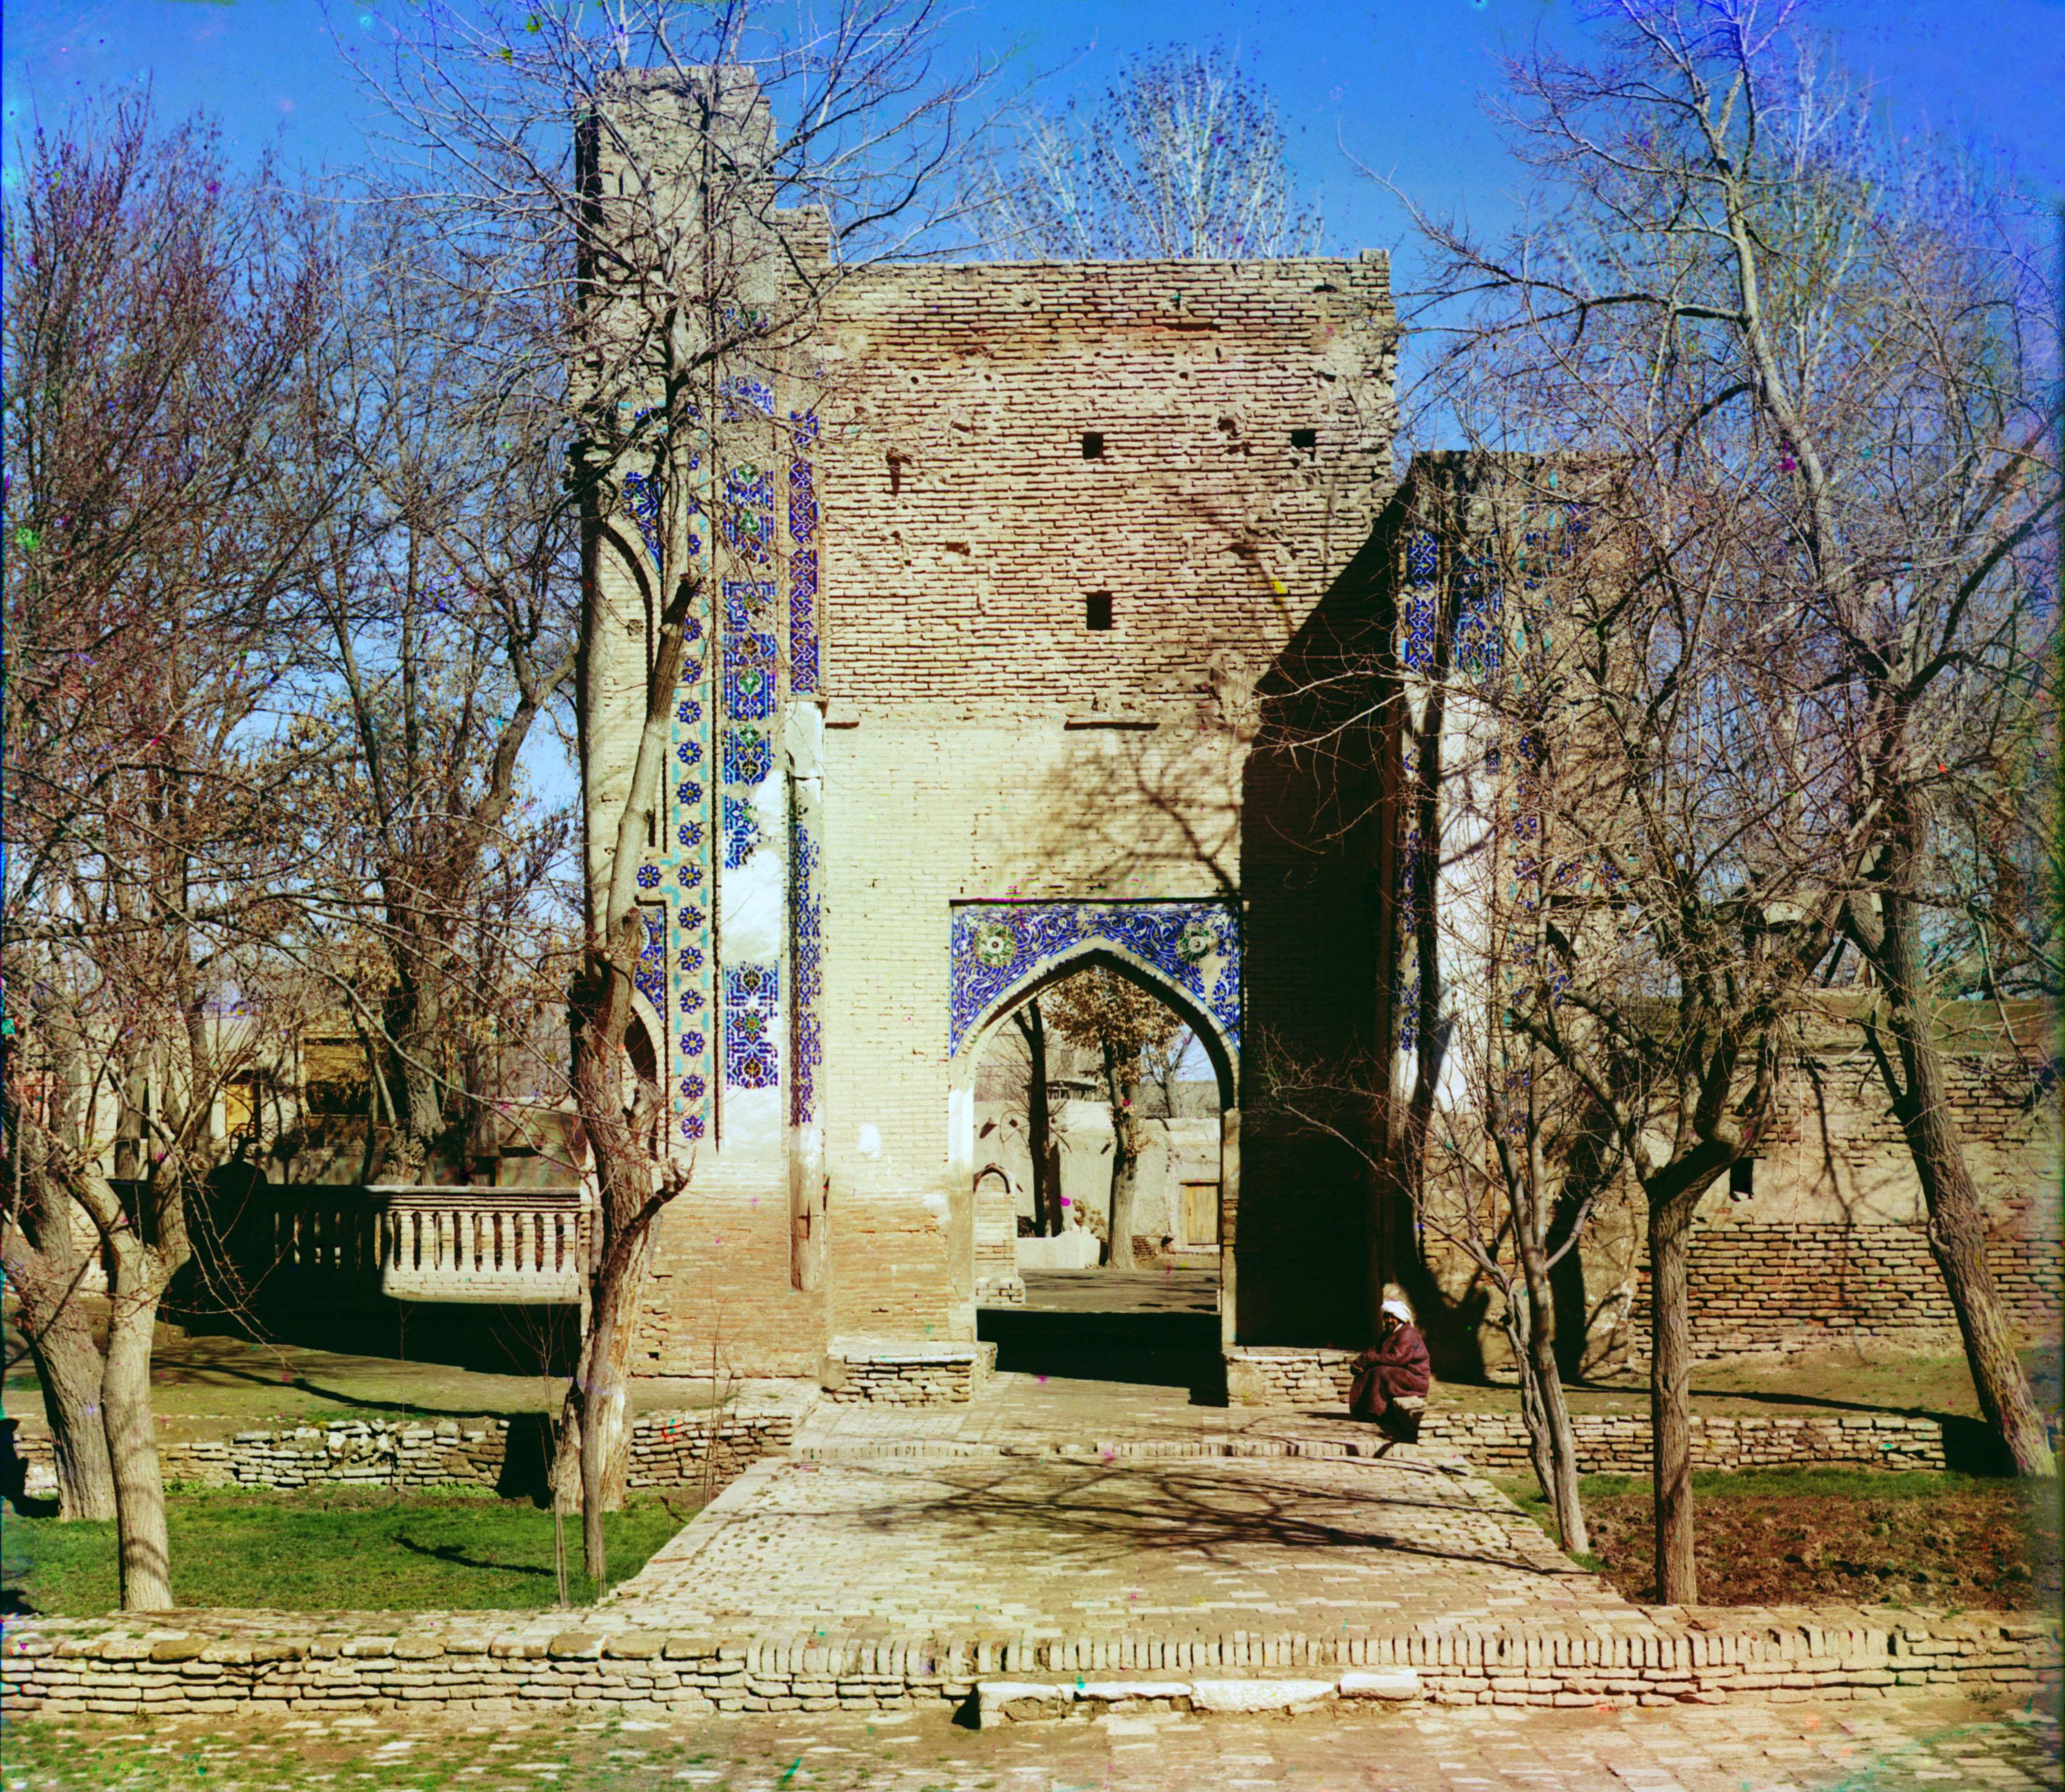 Гур-Эмир. Выход из мечети (мавзолея)